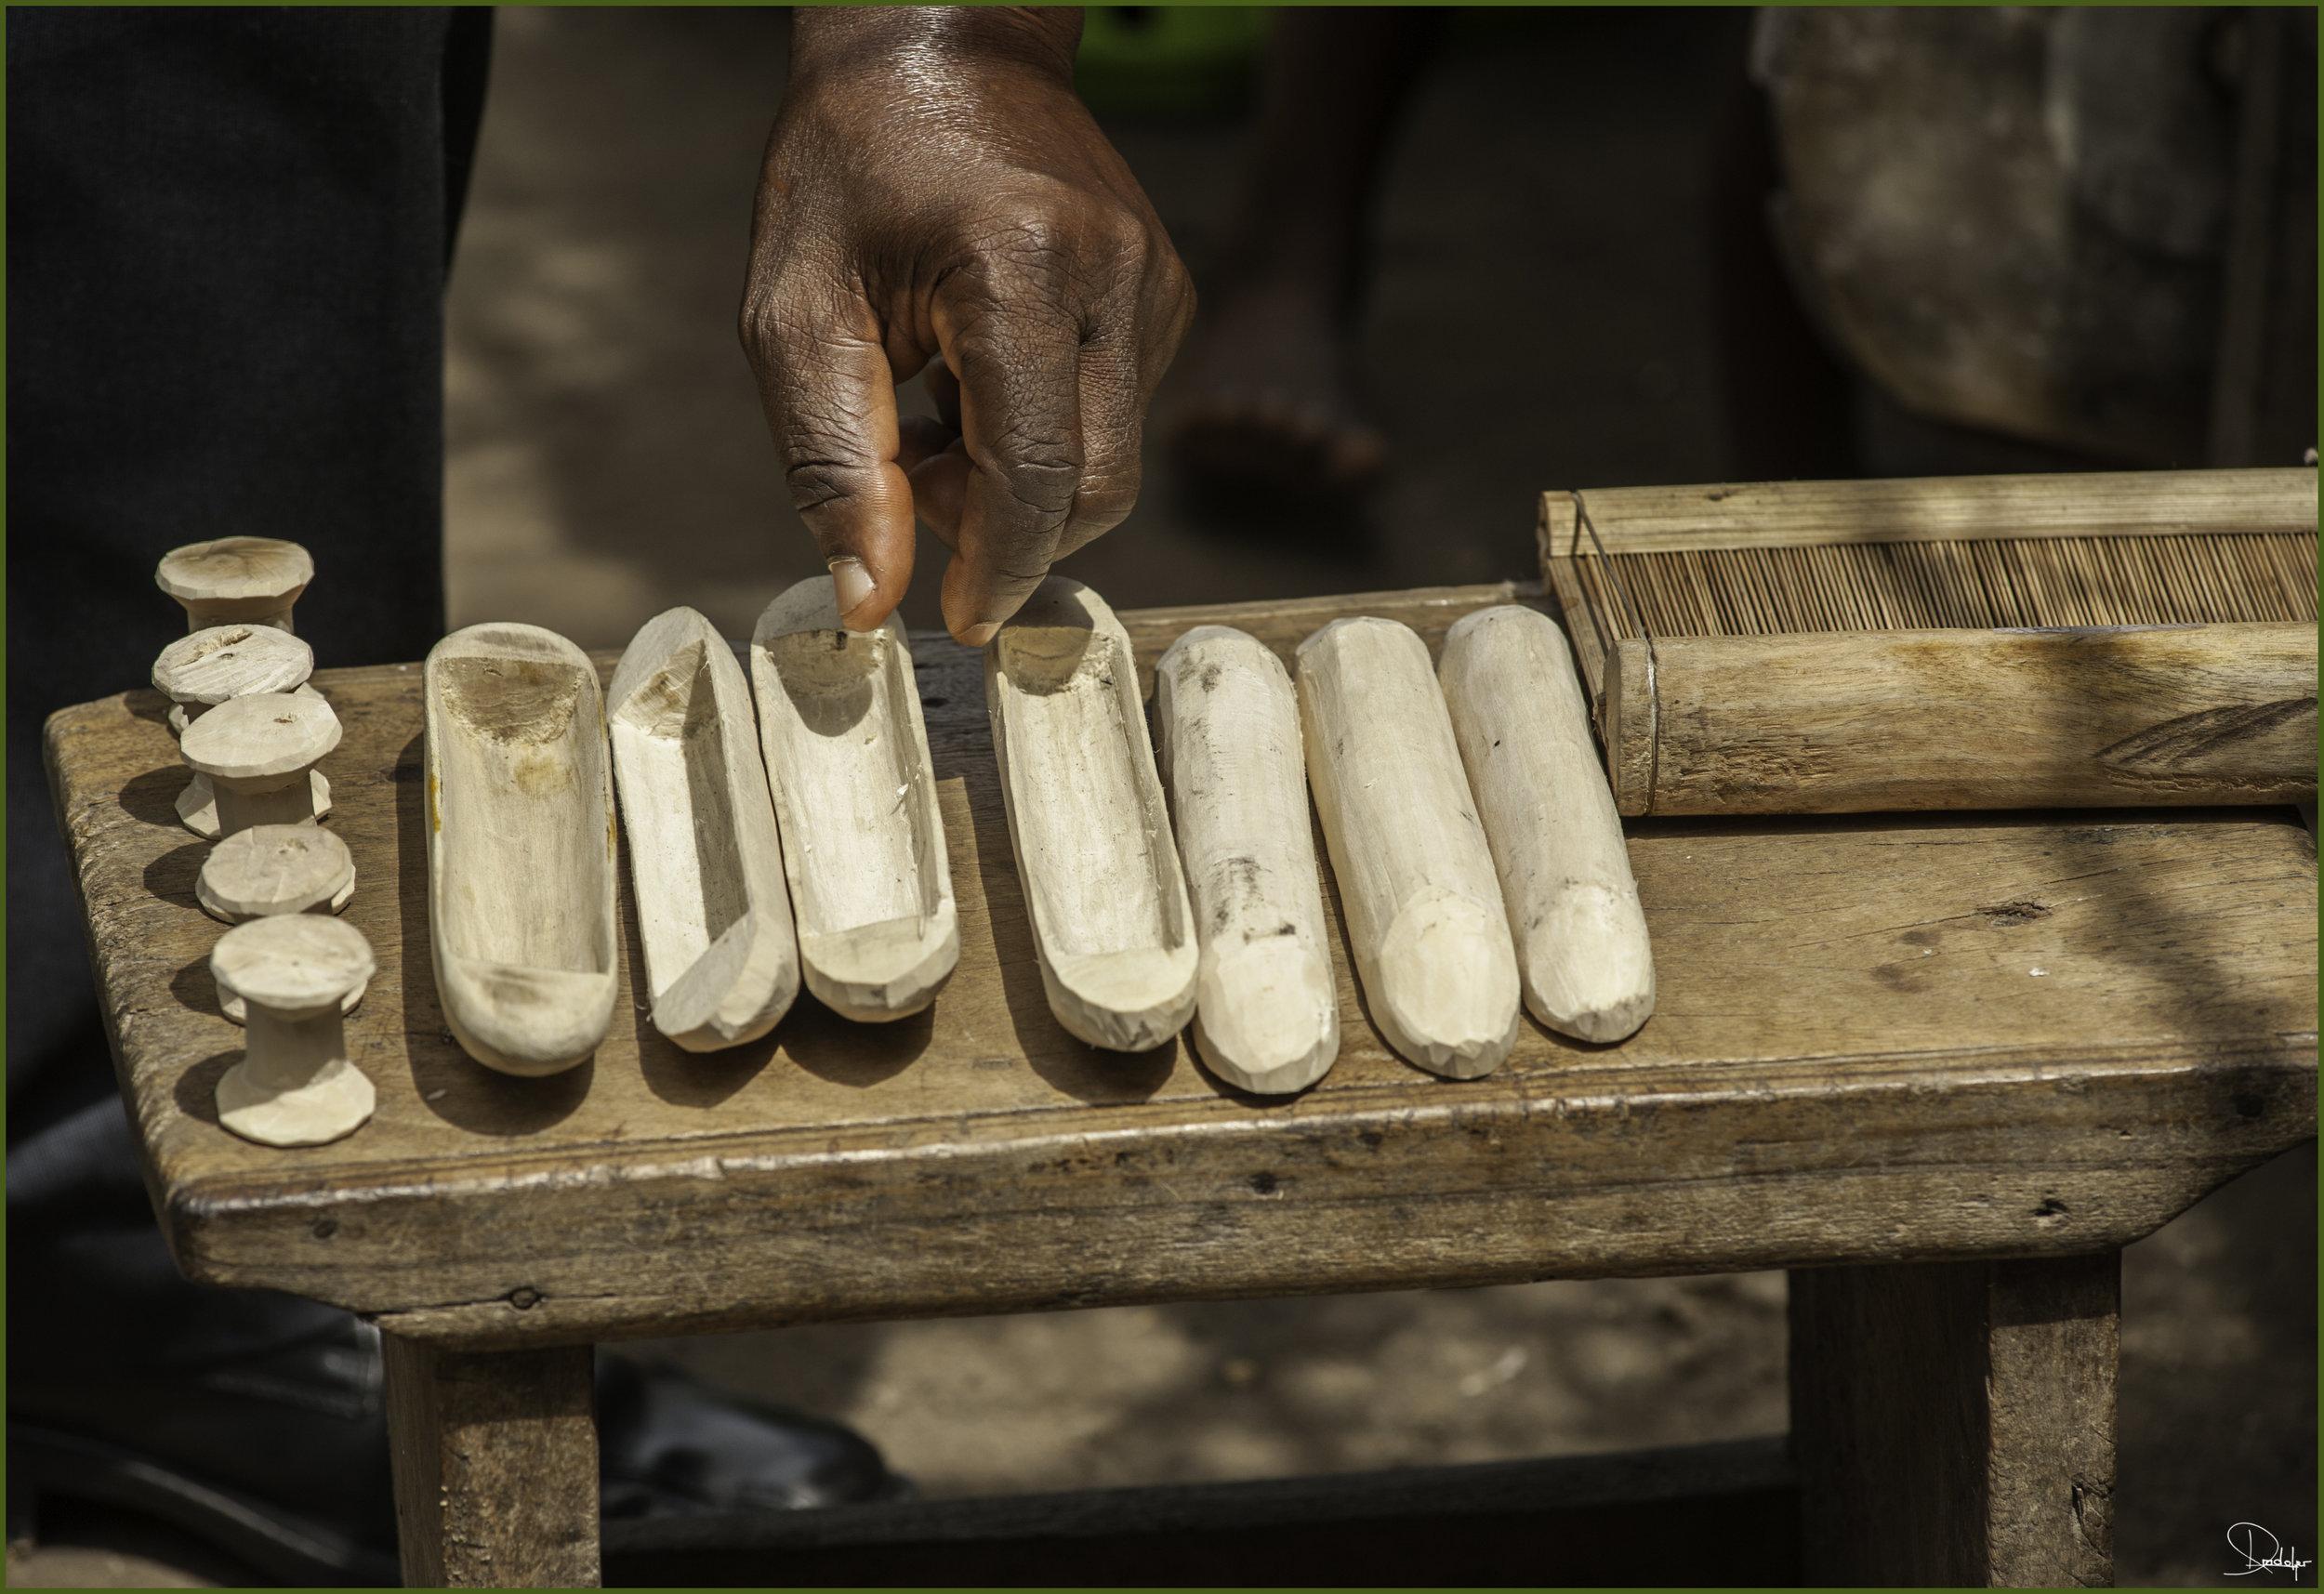 Art of weaving Kente cloth. Photo: Philipe Kradolfer